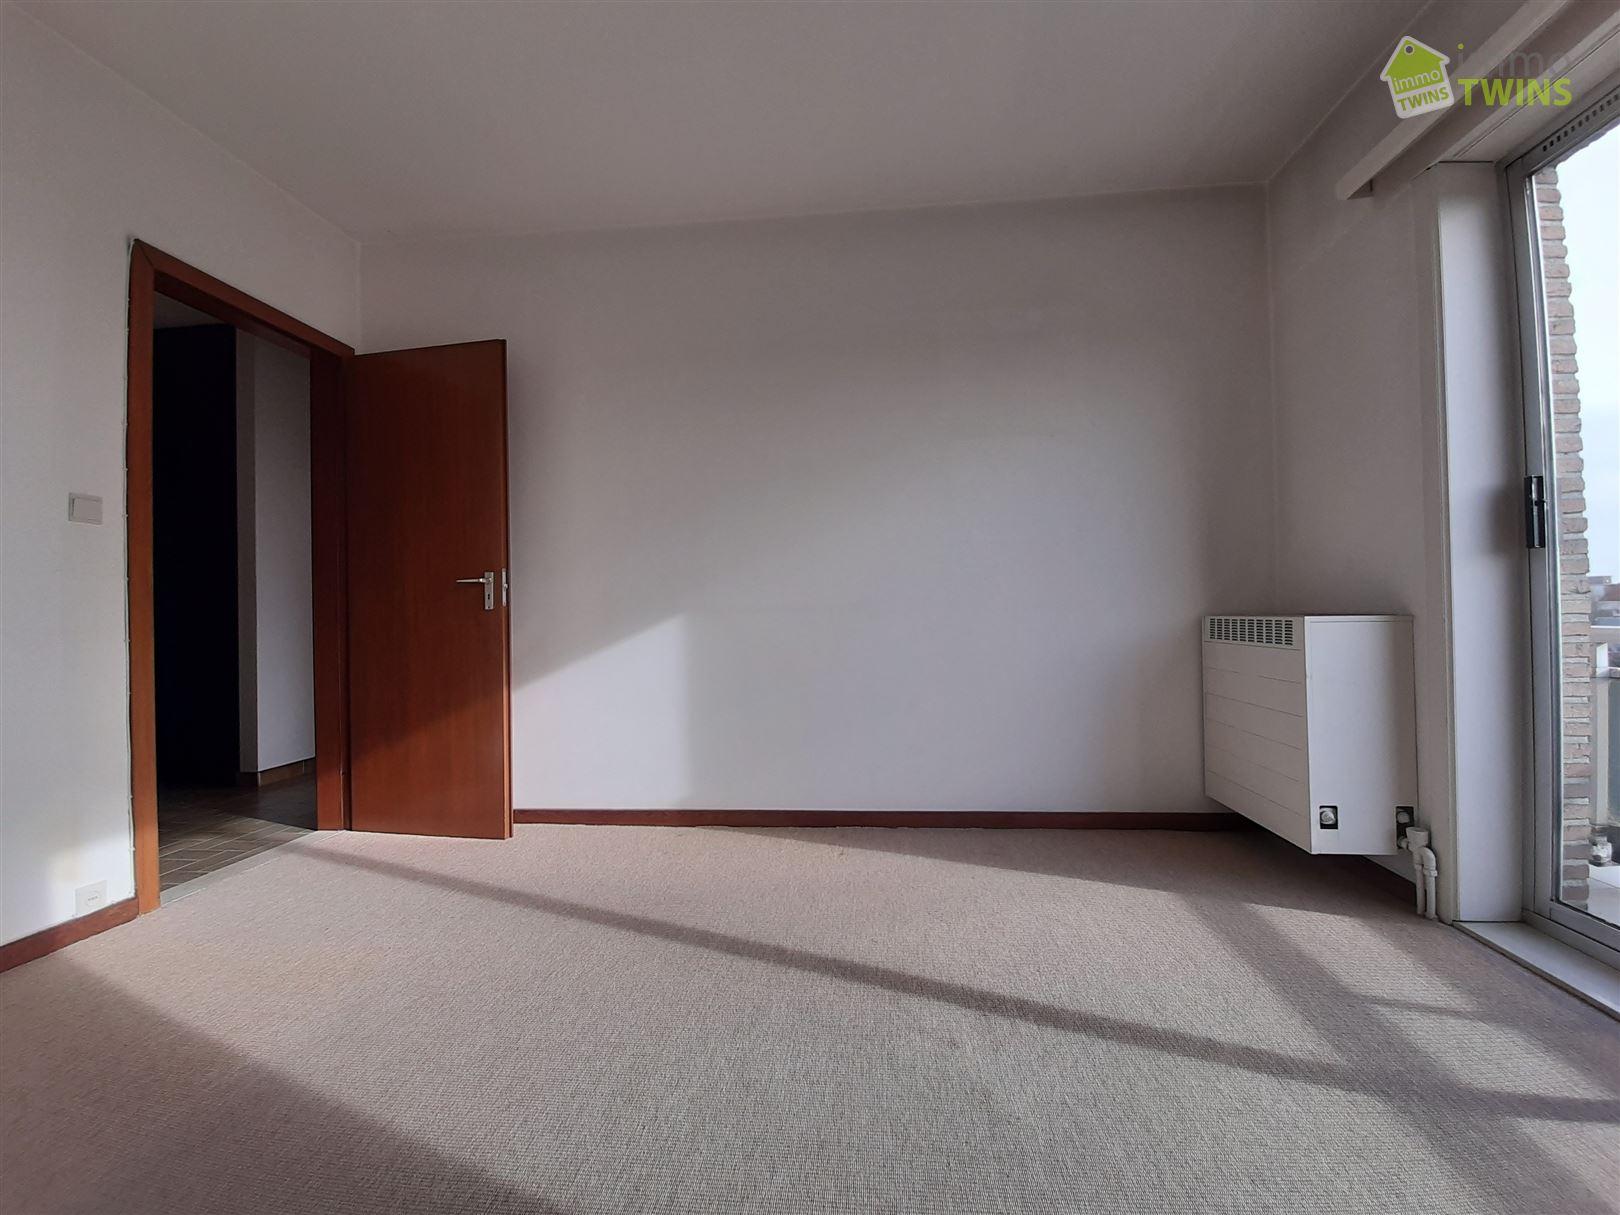 Foto 5 : Appartement te 9200 DENDERMONDE (België) - Prijs € 600